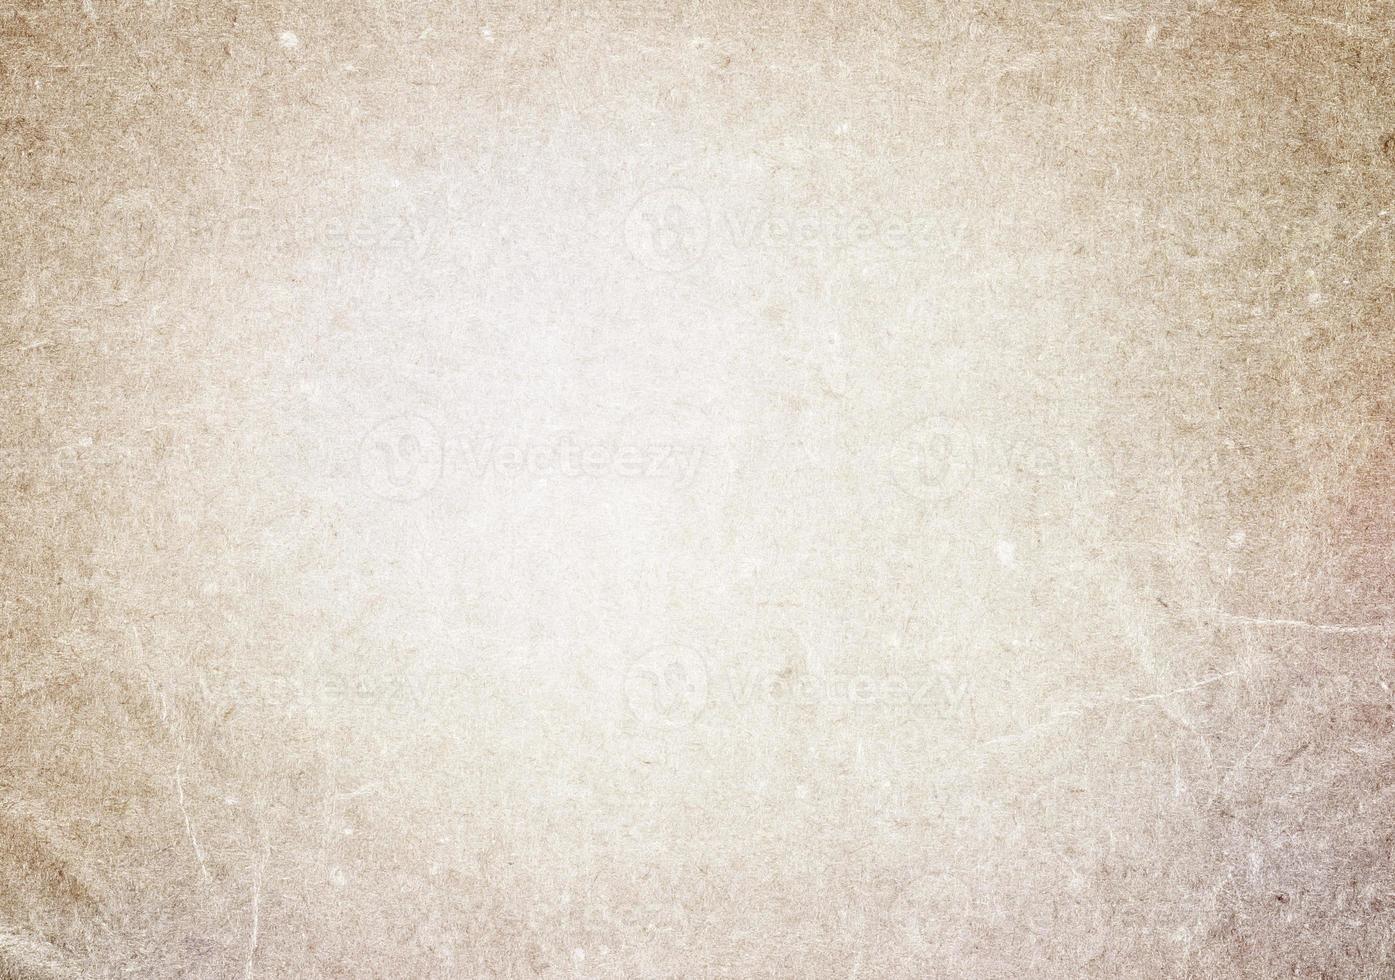 textura de papel grunge marrom foto